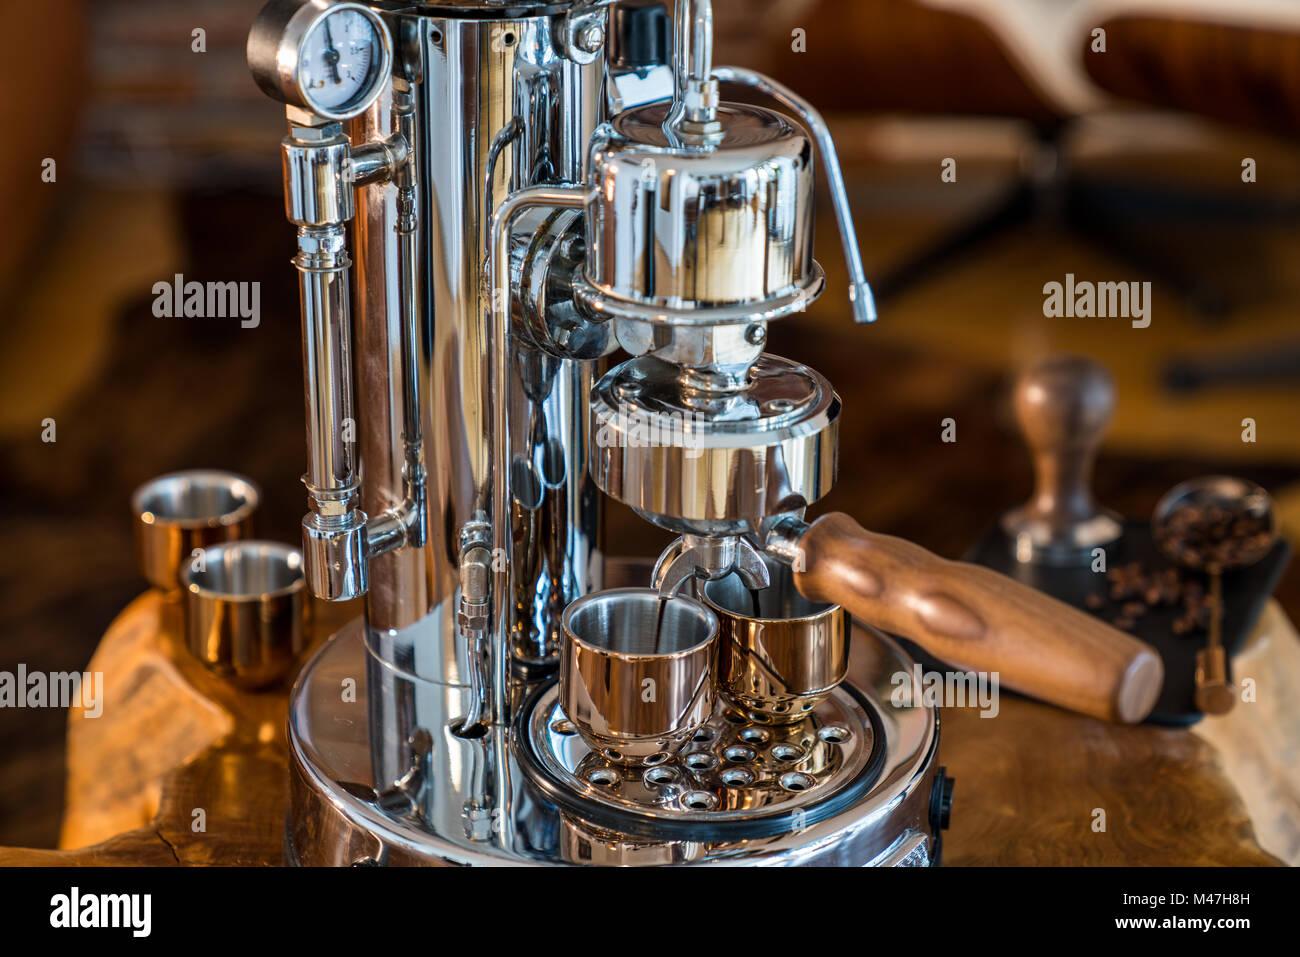 High End Luxury Espresso Machine